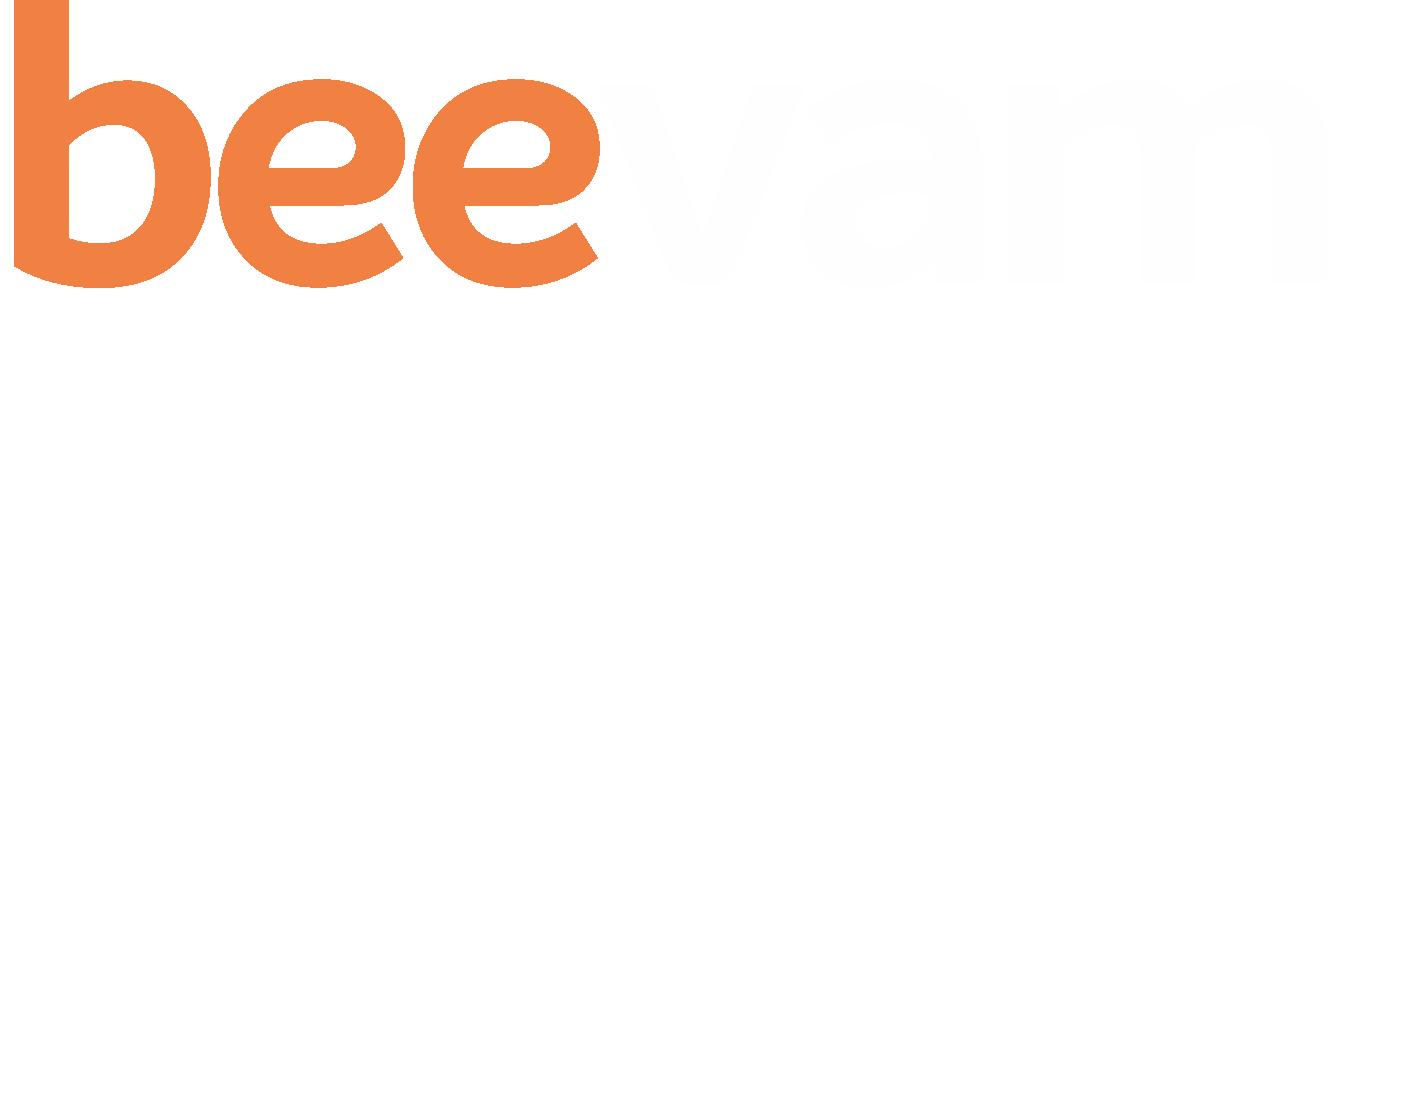 Beevam_3D